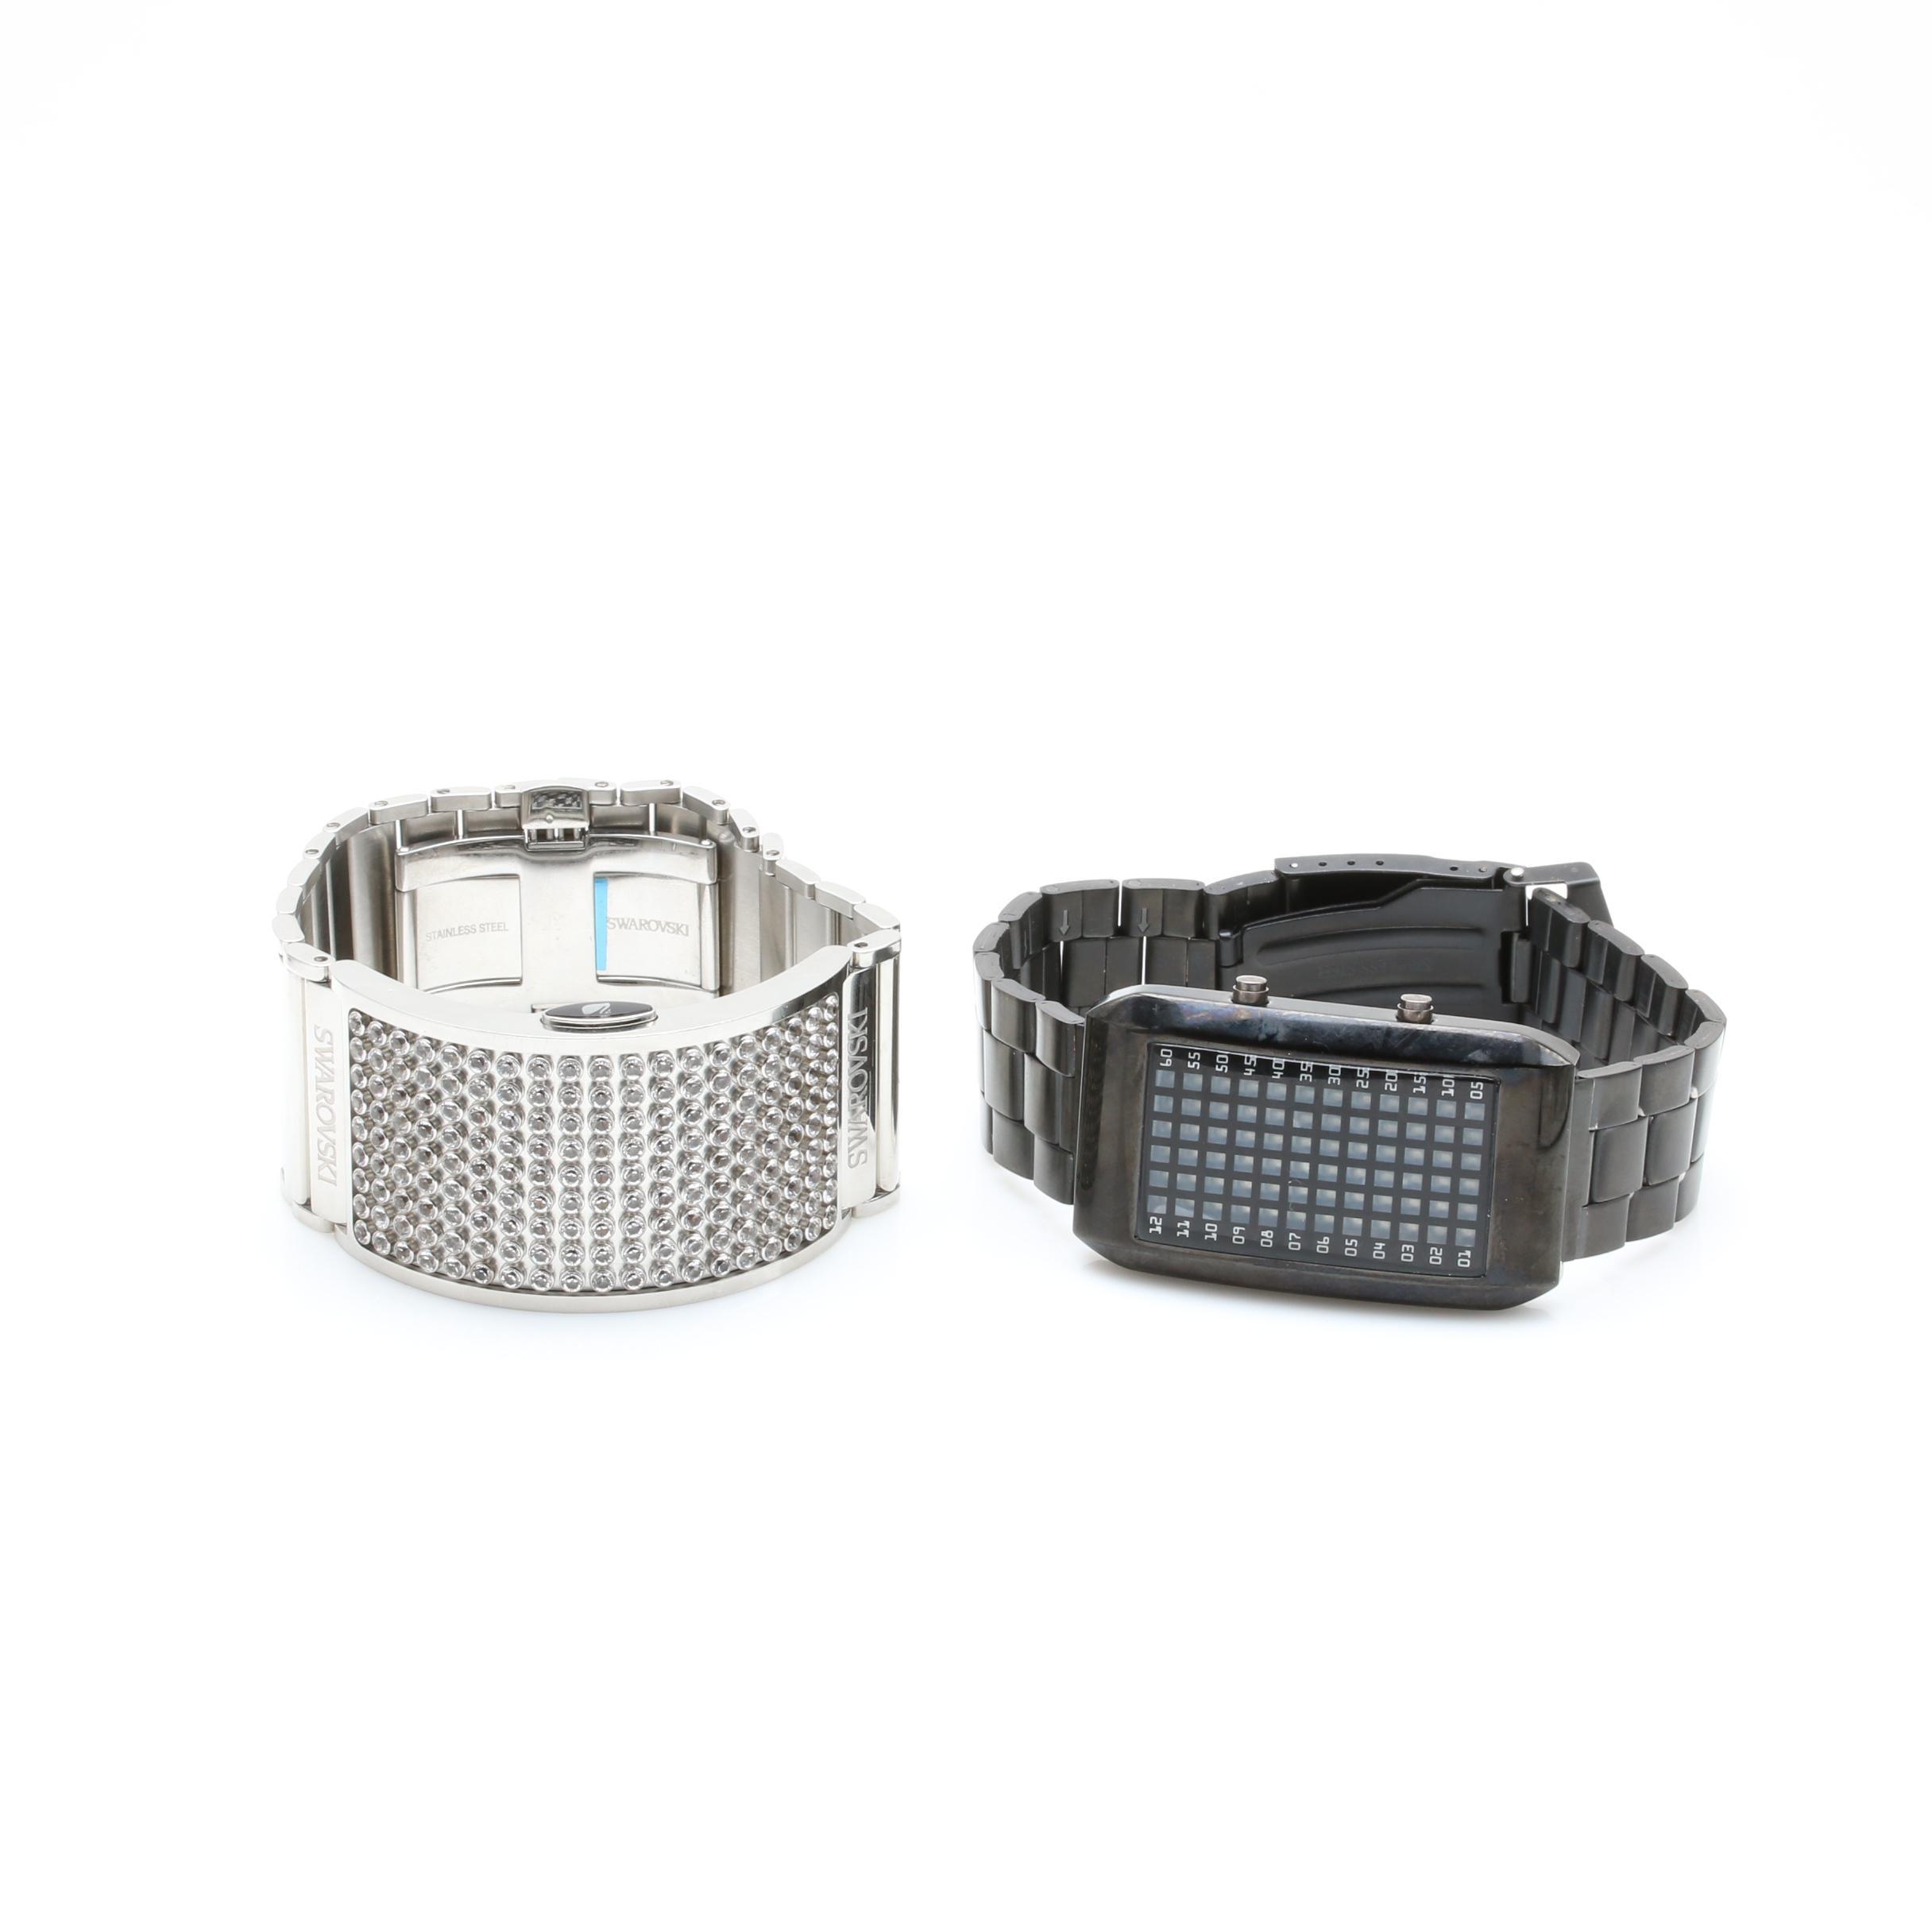 Swarovski and Digital Stainless Steel Wristwatches